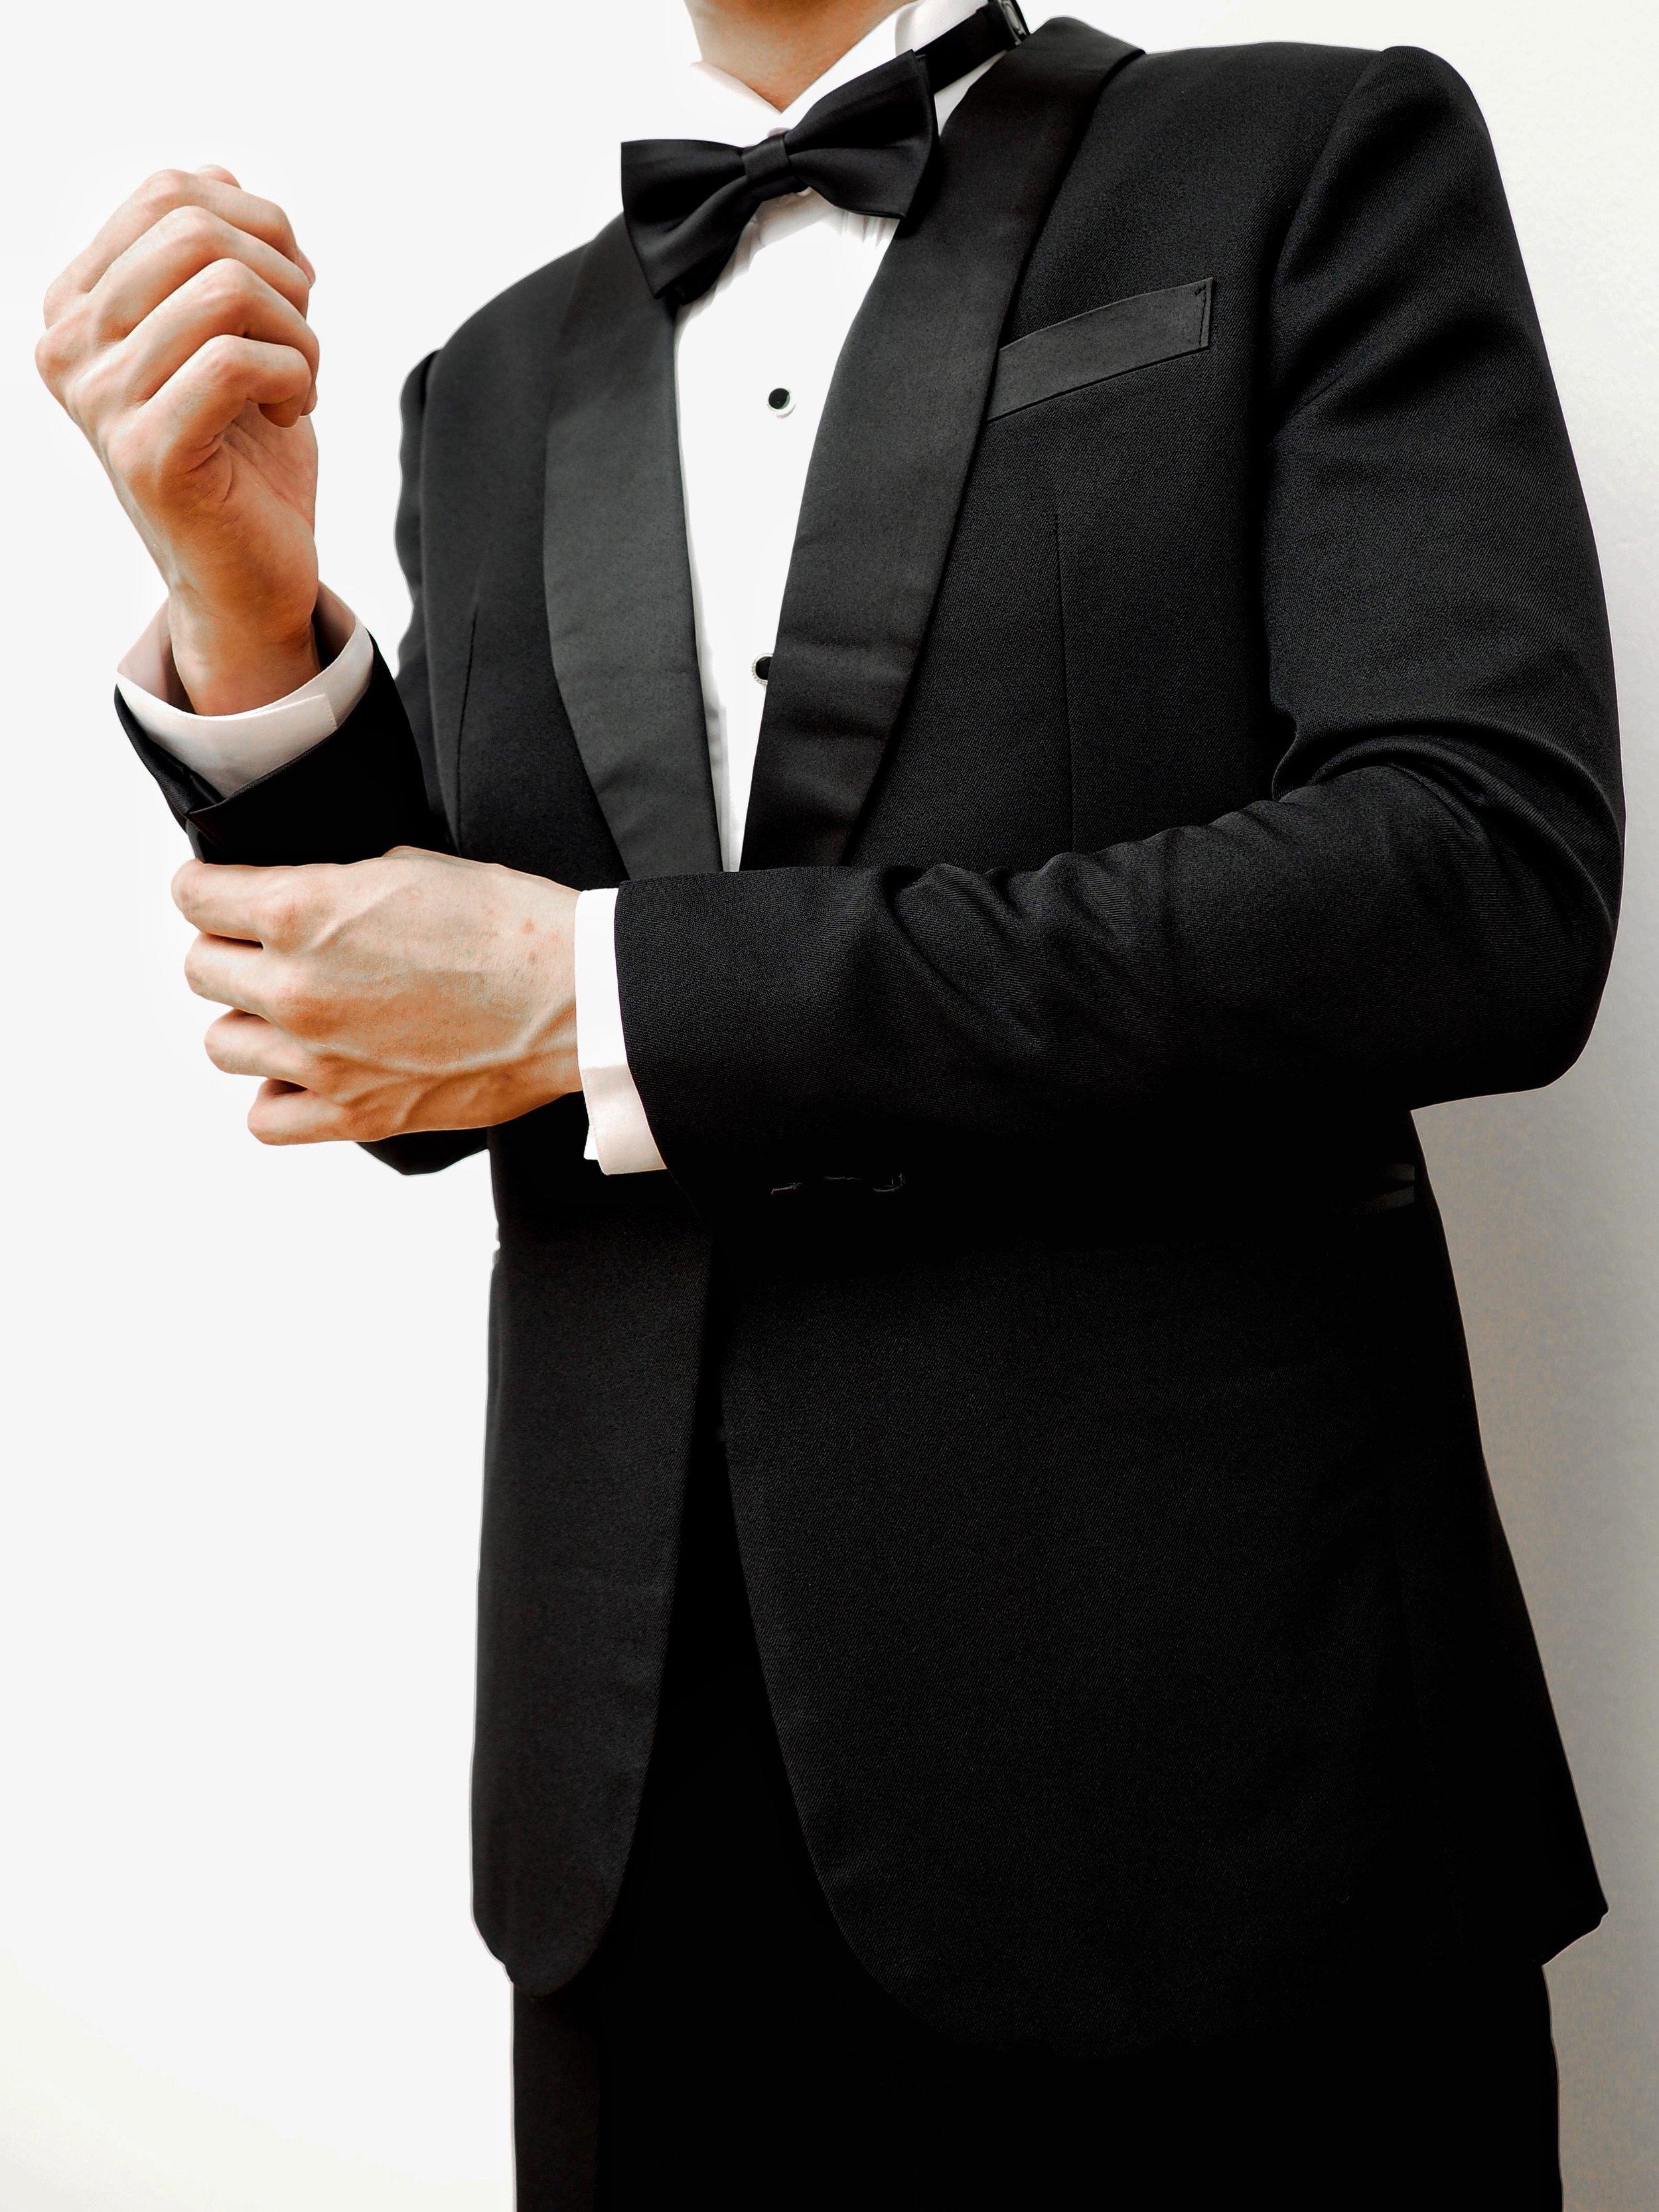 Satin lapels on classic black tux by CCM Wedding